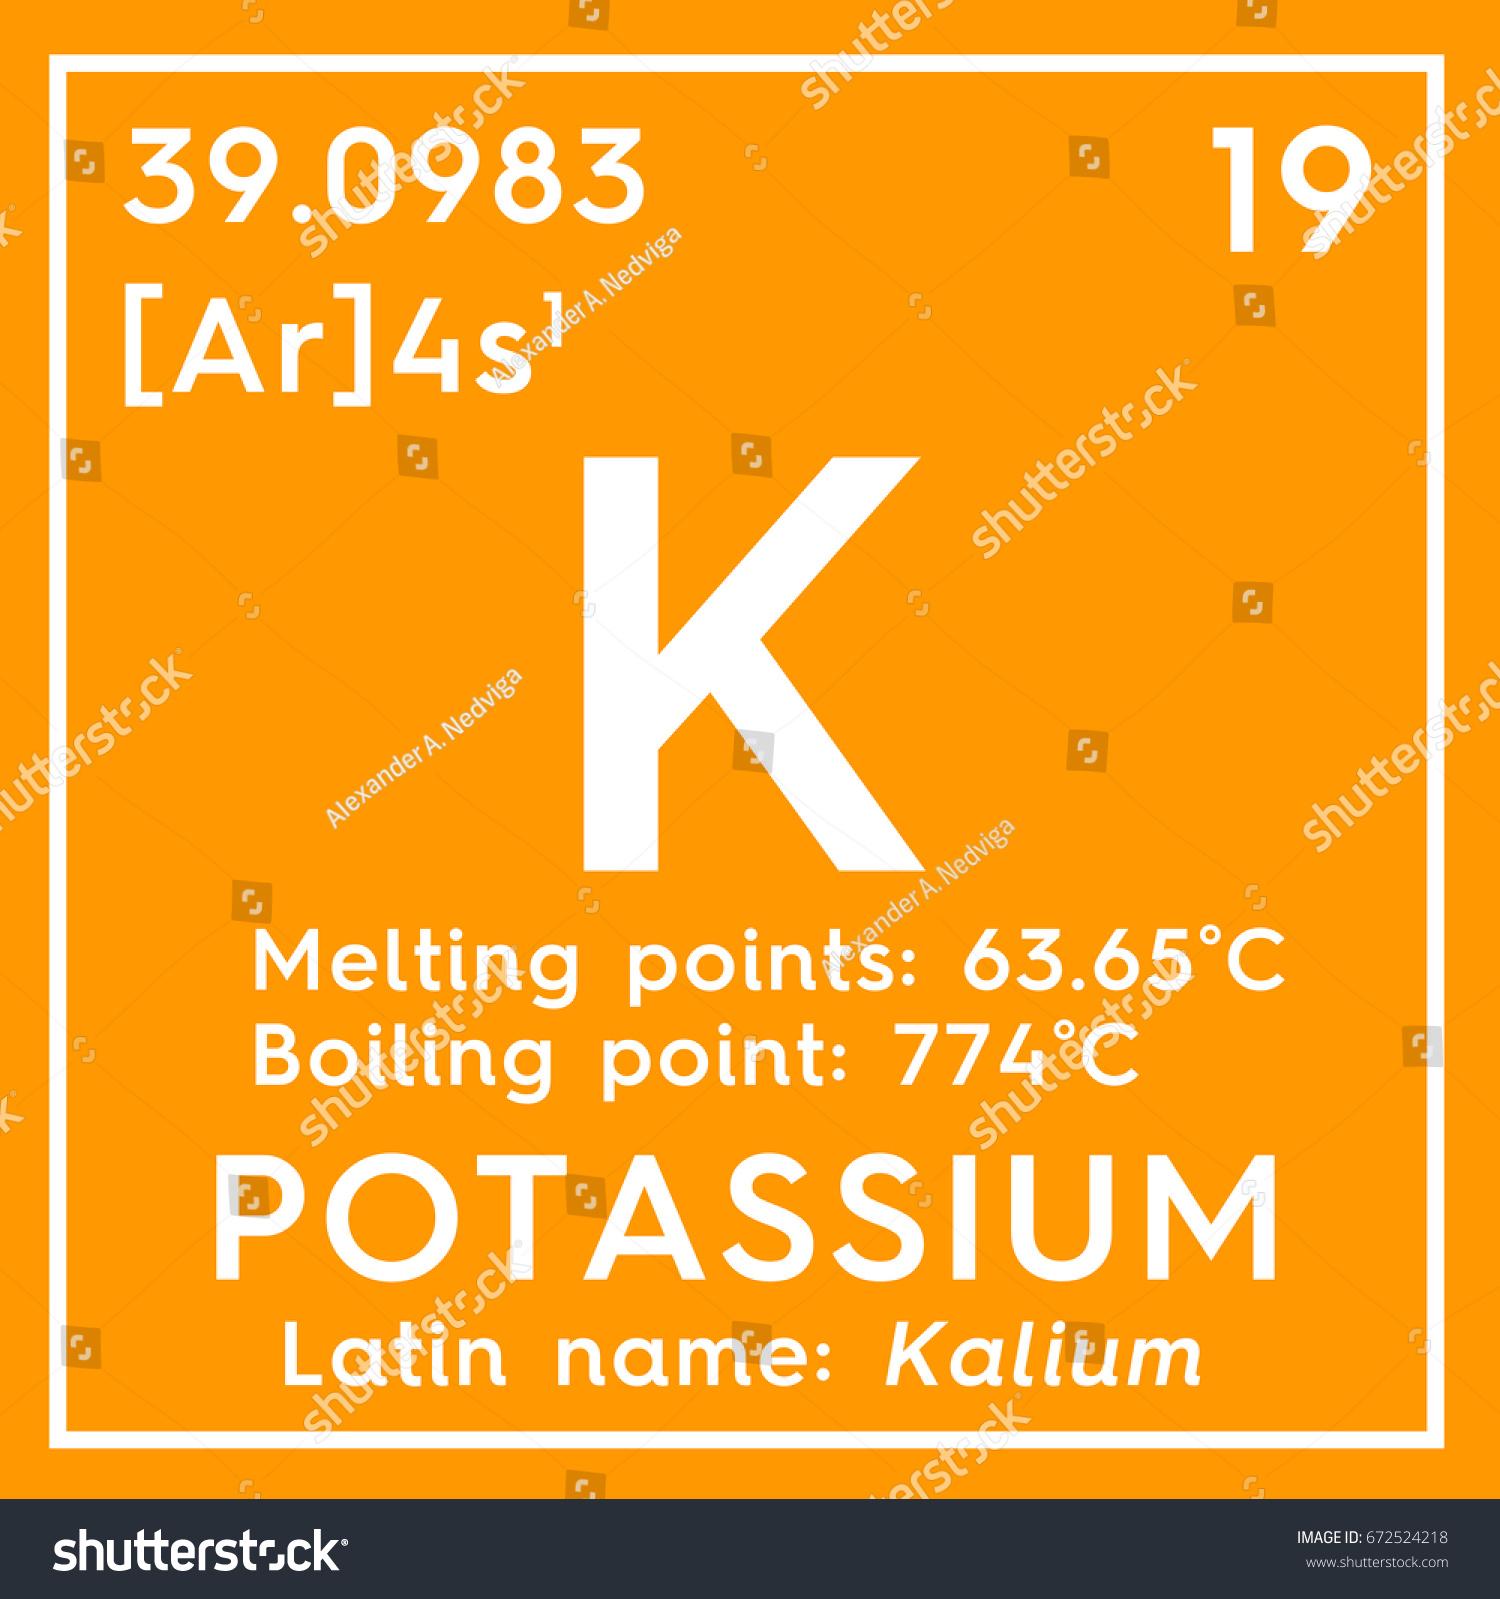 Potassium kalium alkali metals chemical element stock illustration chemical element of mendeleevs periodic table potassium in gamestrikefo Choice Image